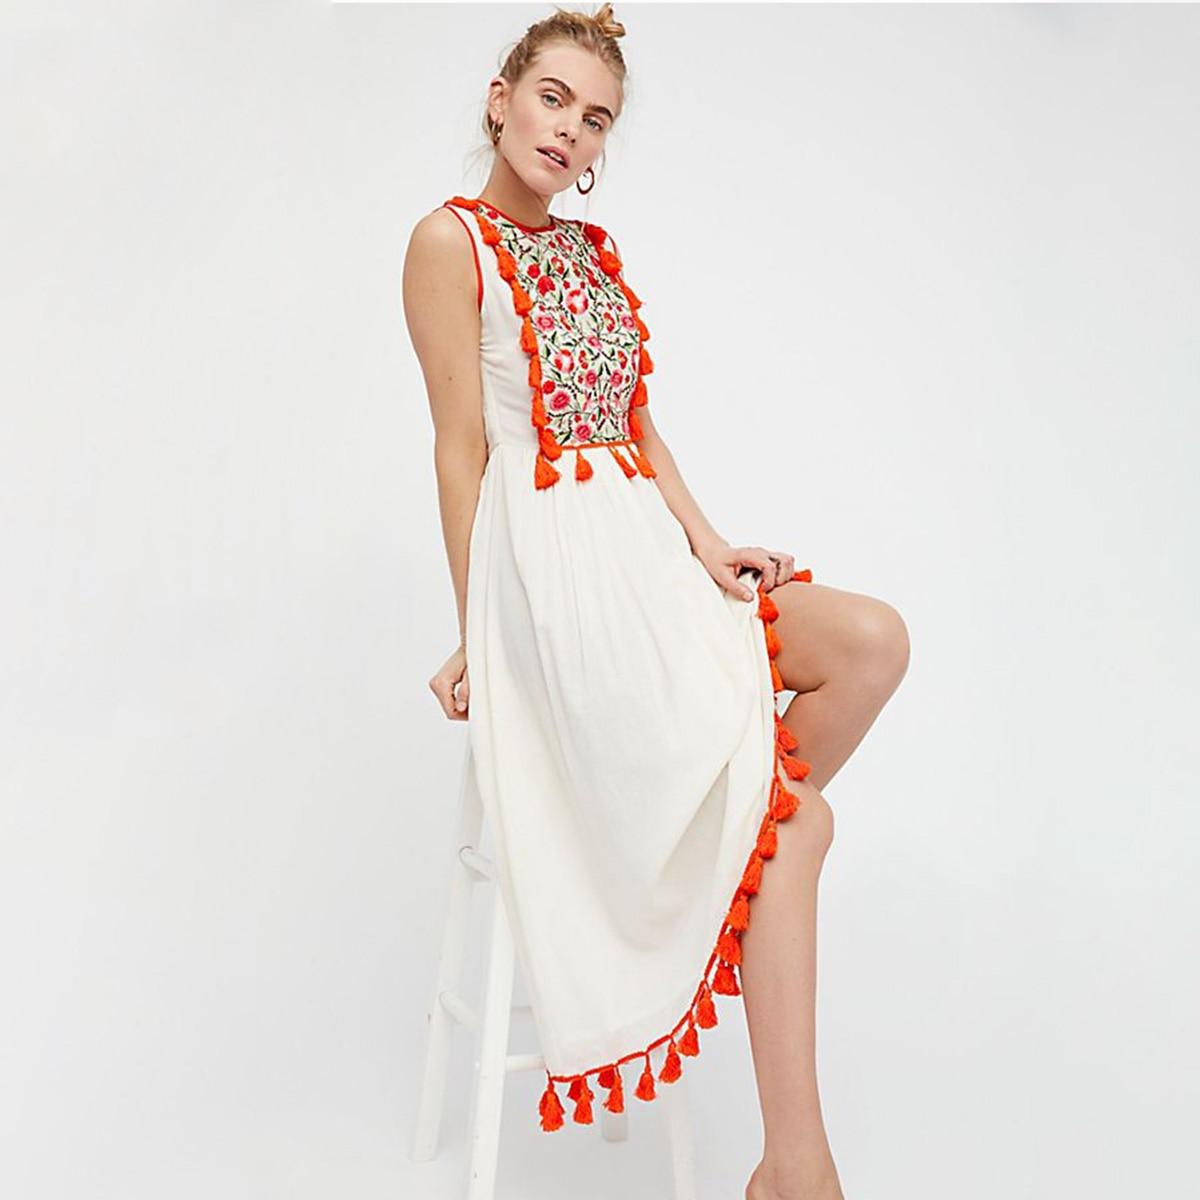 Élégant kiara Maxi robe femmes été sans manches O cou broderie gland robe dames Boho Hippie plage blanc longue robe 2018